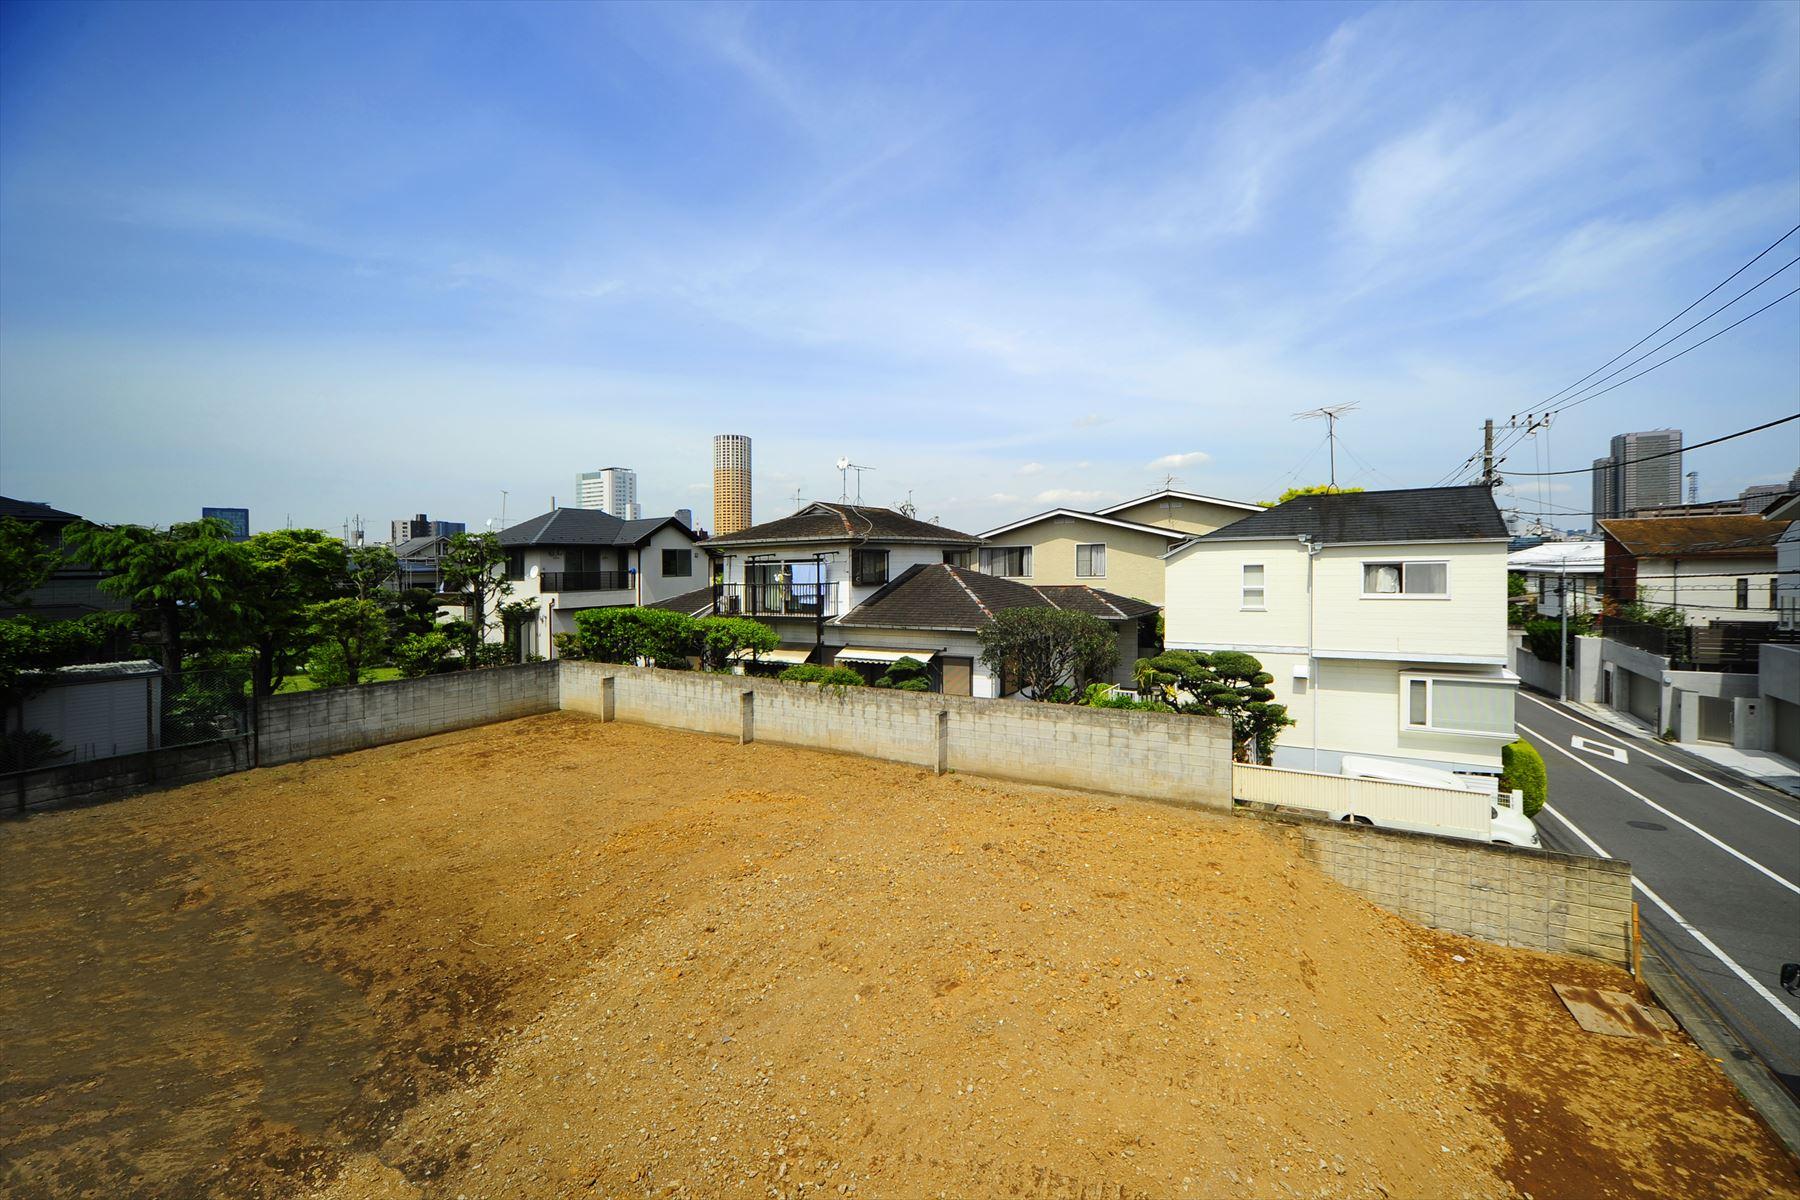 Terreno per Vendita alle ore Nakameguro 3chome Land Meguro, Meguro-Ku, Tokyo Giappone